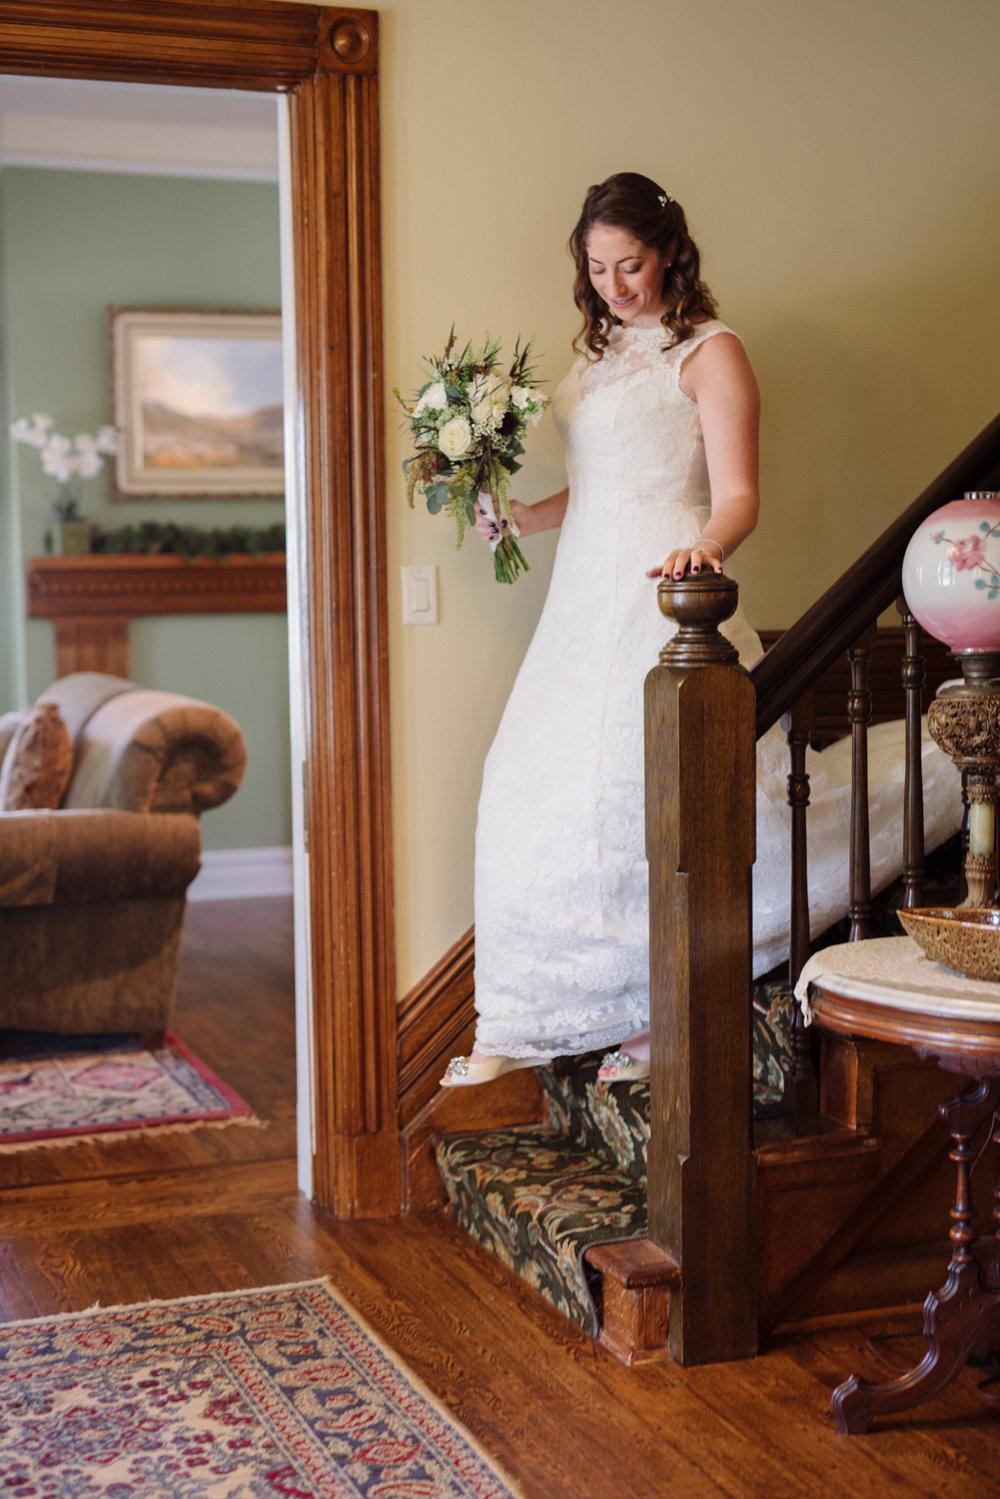 Kaitlin+Harley- Raritan Inn Wedding- Fall Tent Wedding- New Jersey- Olivia Christina Photography-2.JPG